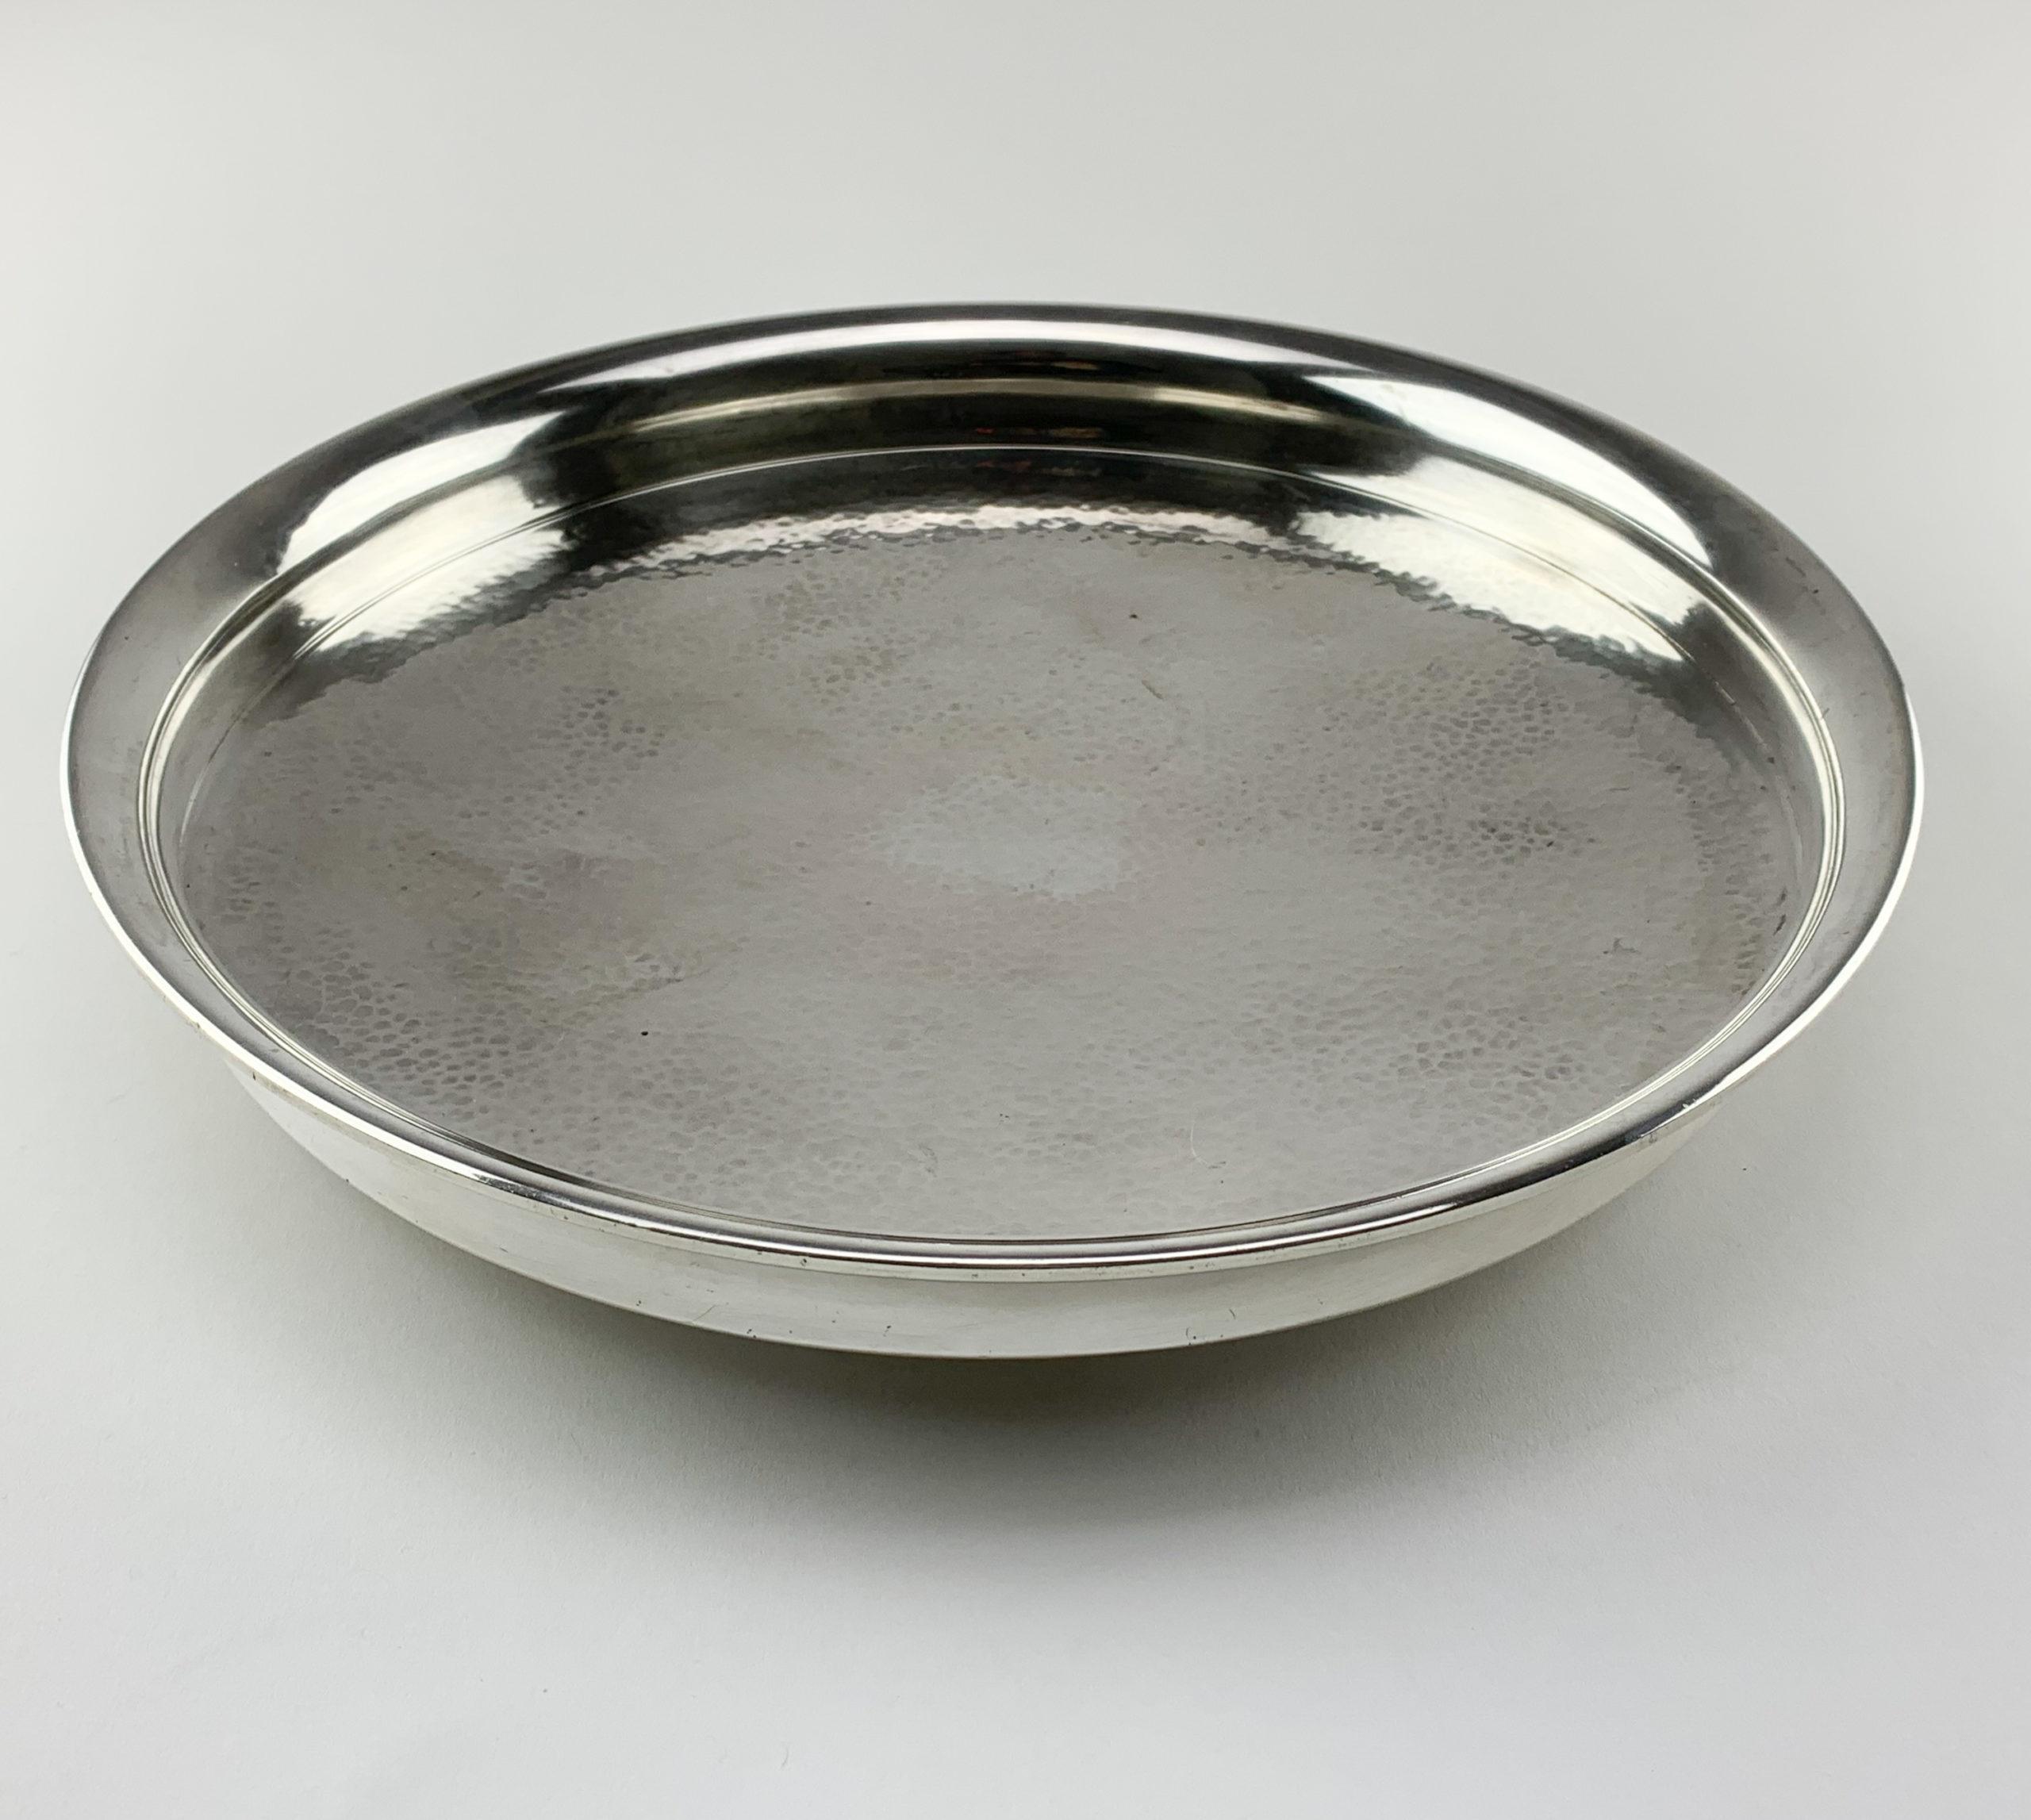 TW silver dish 1stdibs-1478